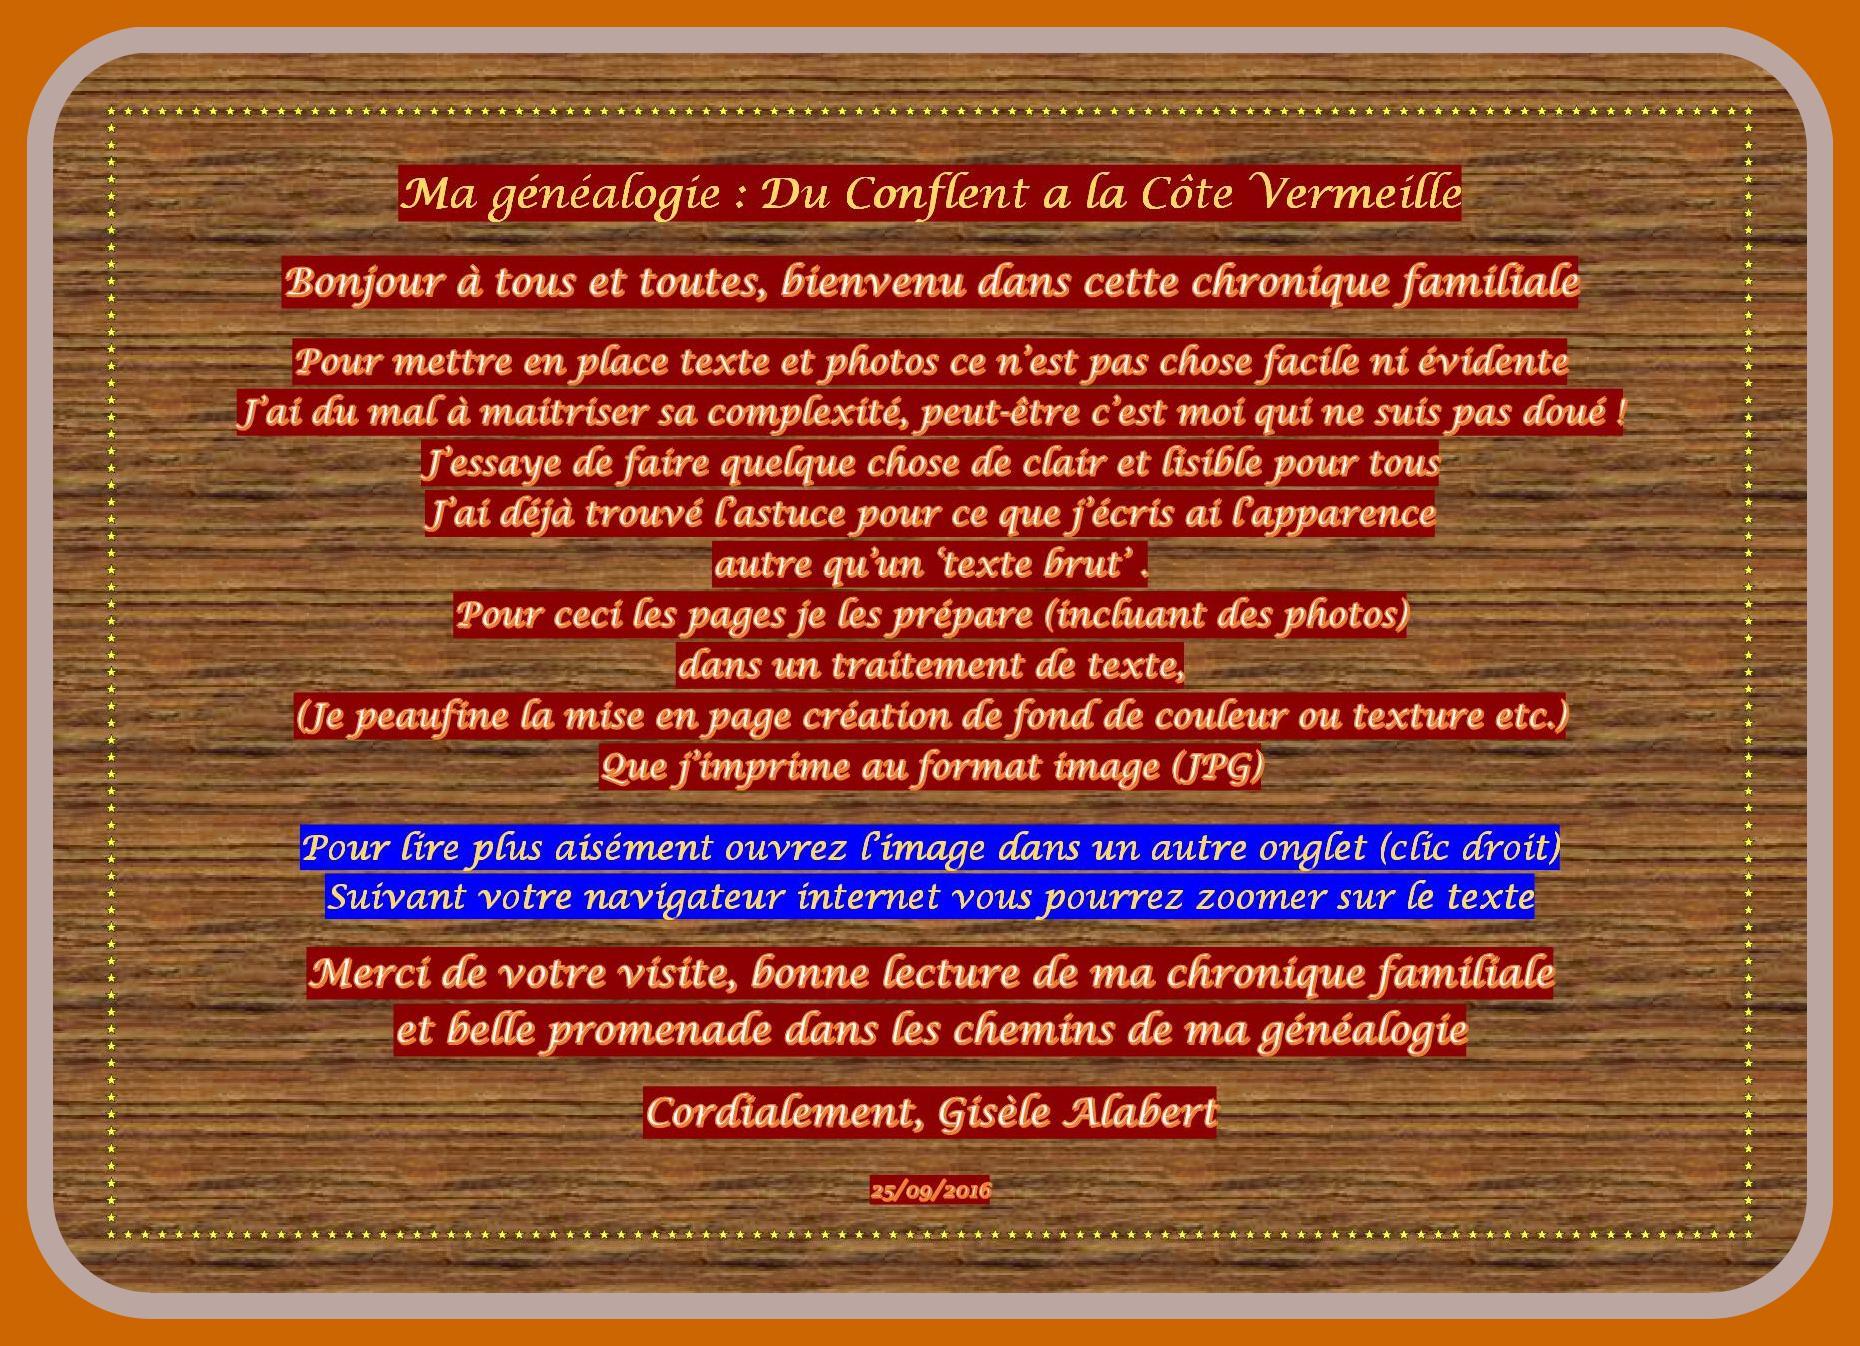 chronique_familiale_presentation_CADRE_25_09_2016_.jpg